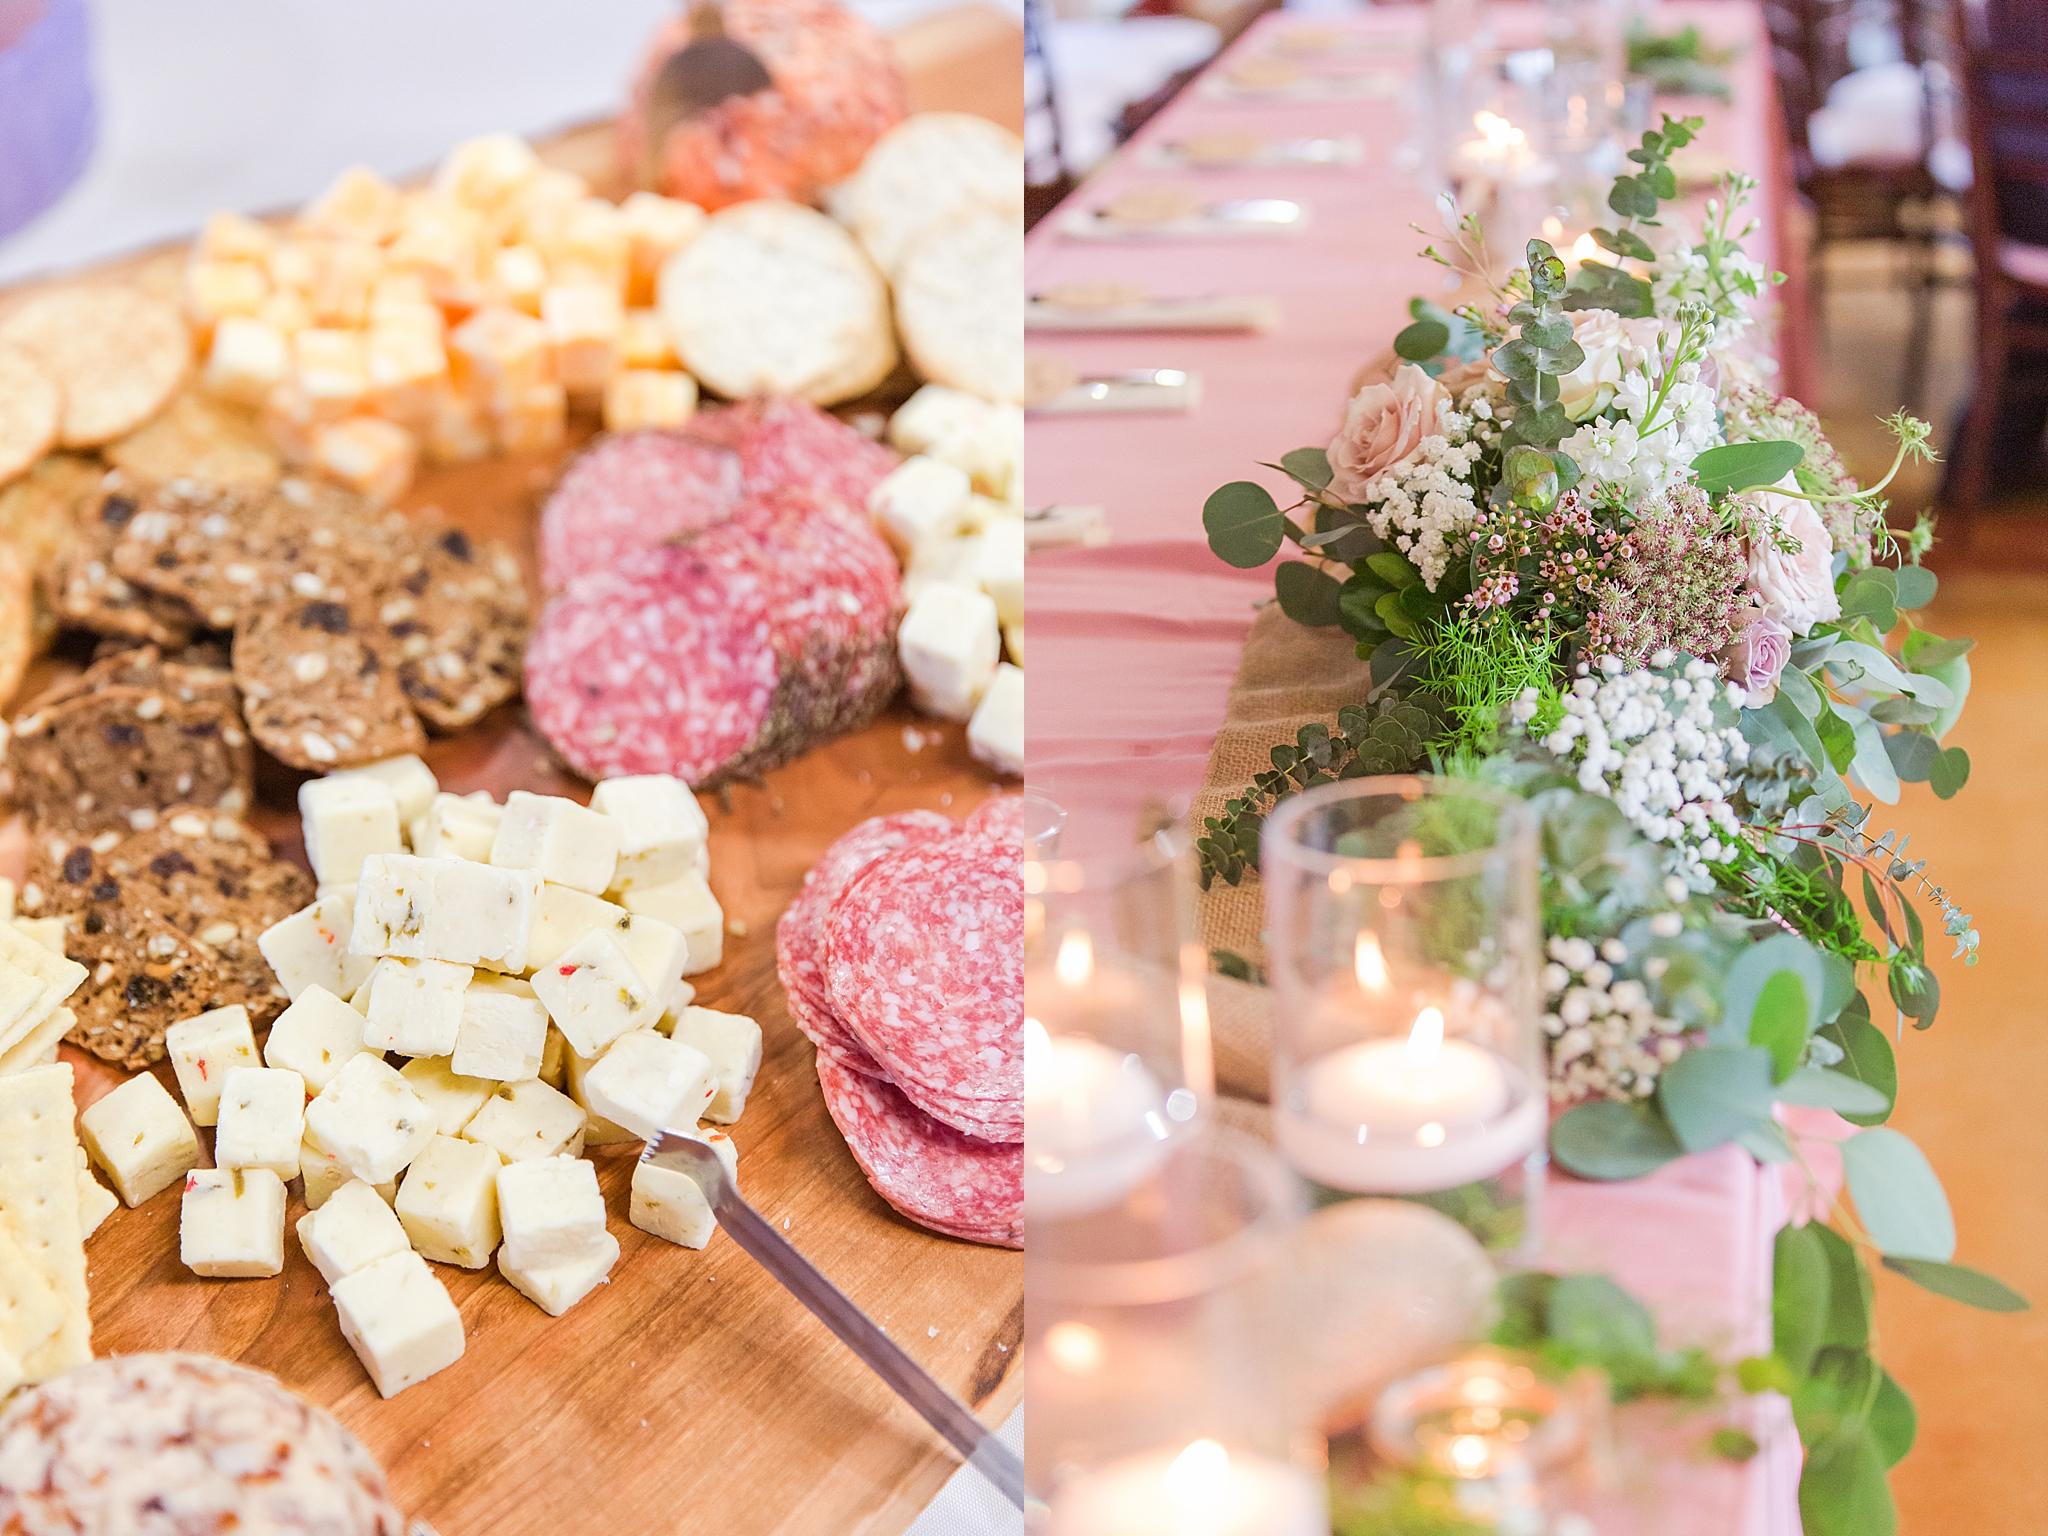 detroit-wedding-photographer-brownstown-event-center-wedding-photos-sam-josh-by-courtney-carolyn-photography_0066.jpg